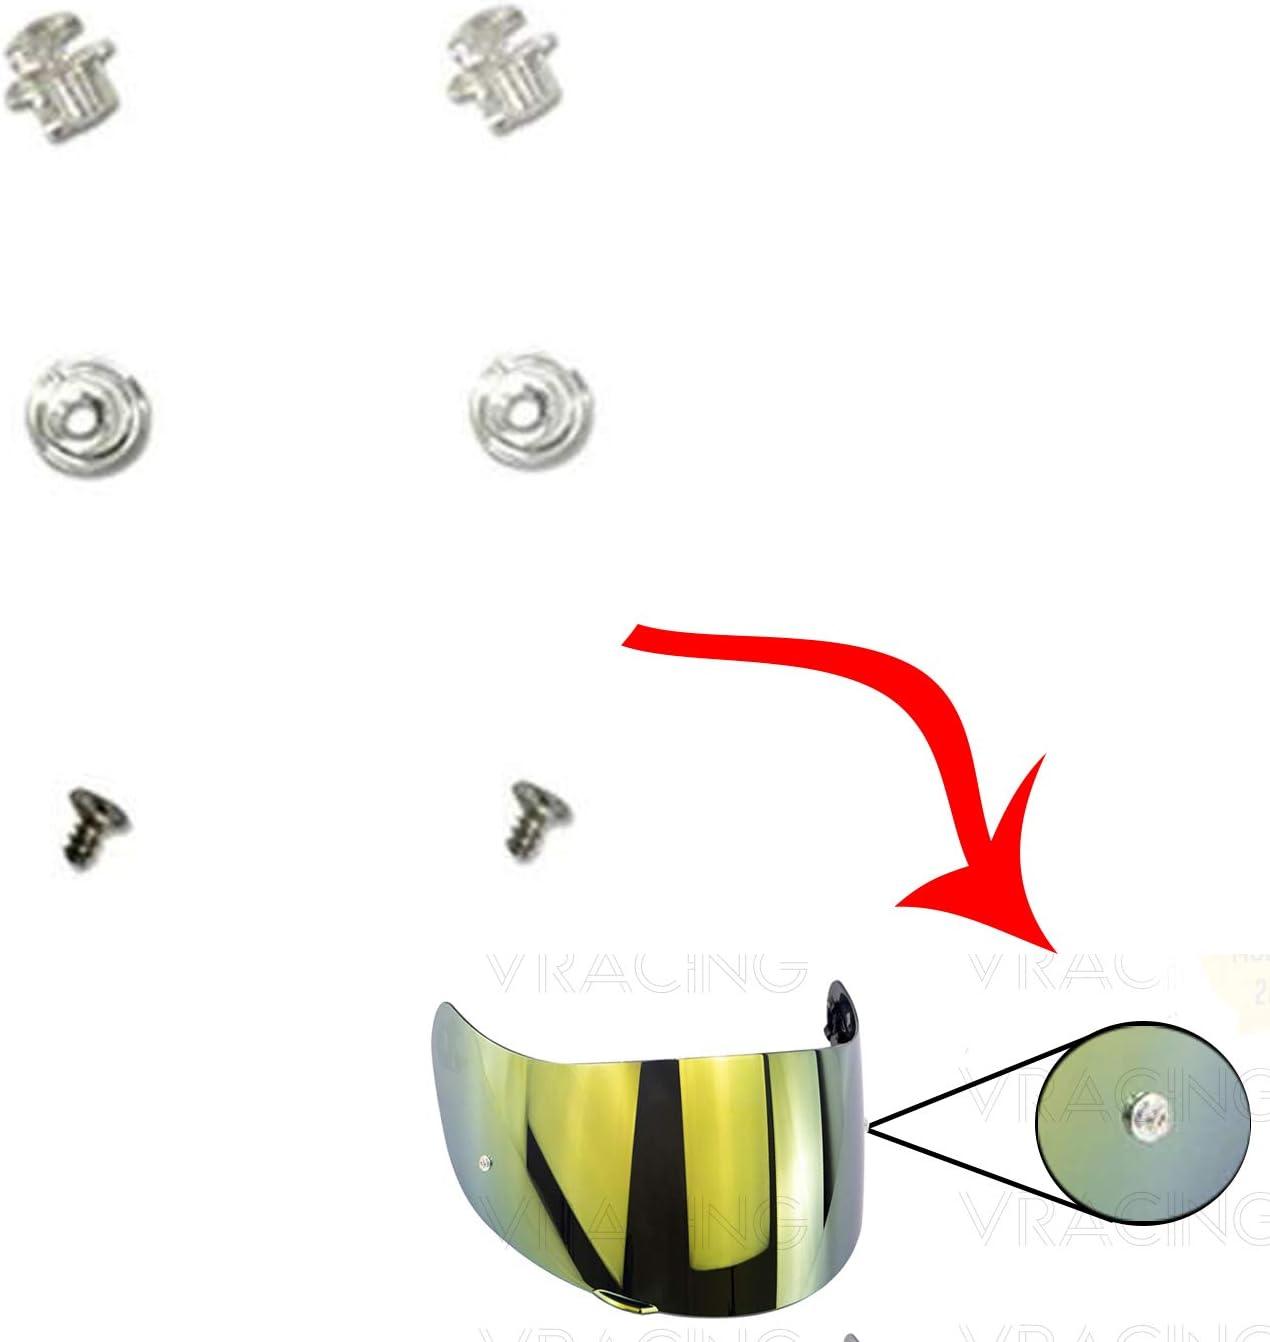 Par de pernos Pinlock para visera de casco AGV K3 Sv K1 K5 K5s S4-Sv Horizon Stealth-Sv Skyline Strada Numo Aftermerket GT2 GT2-1 VRacing